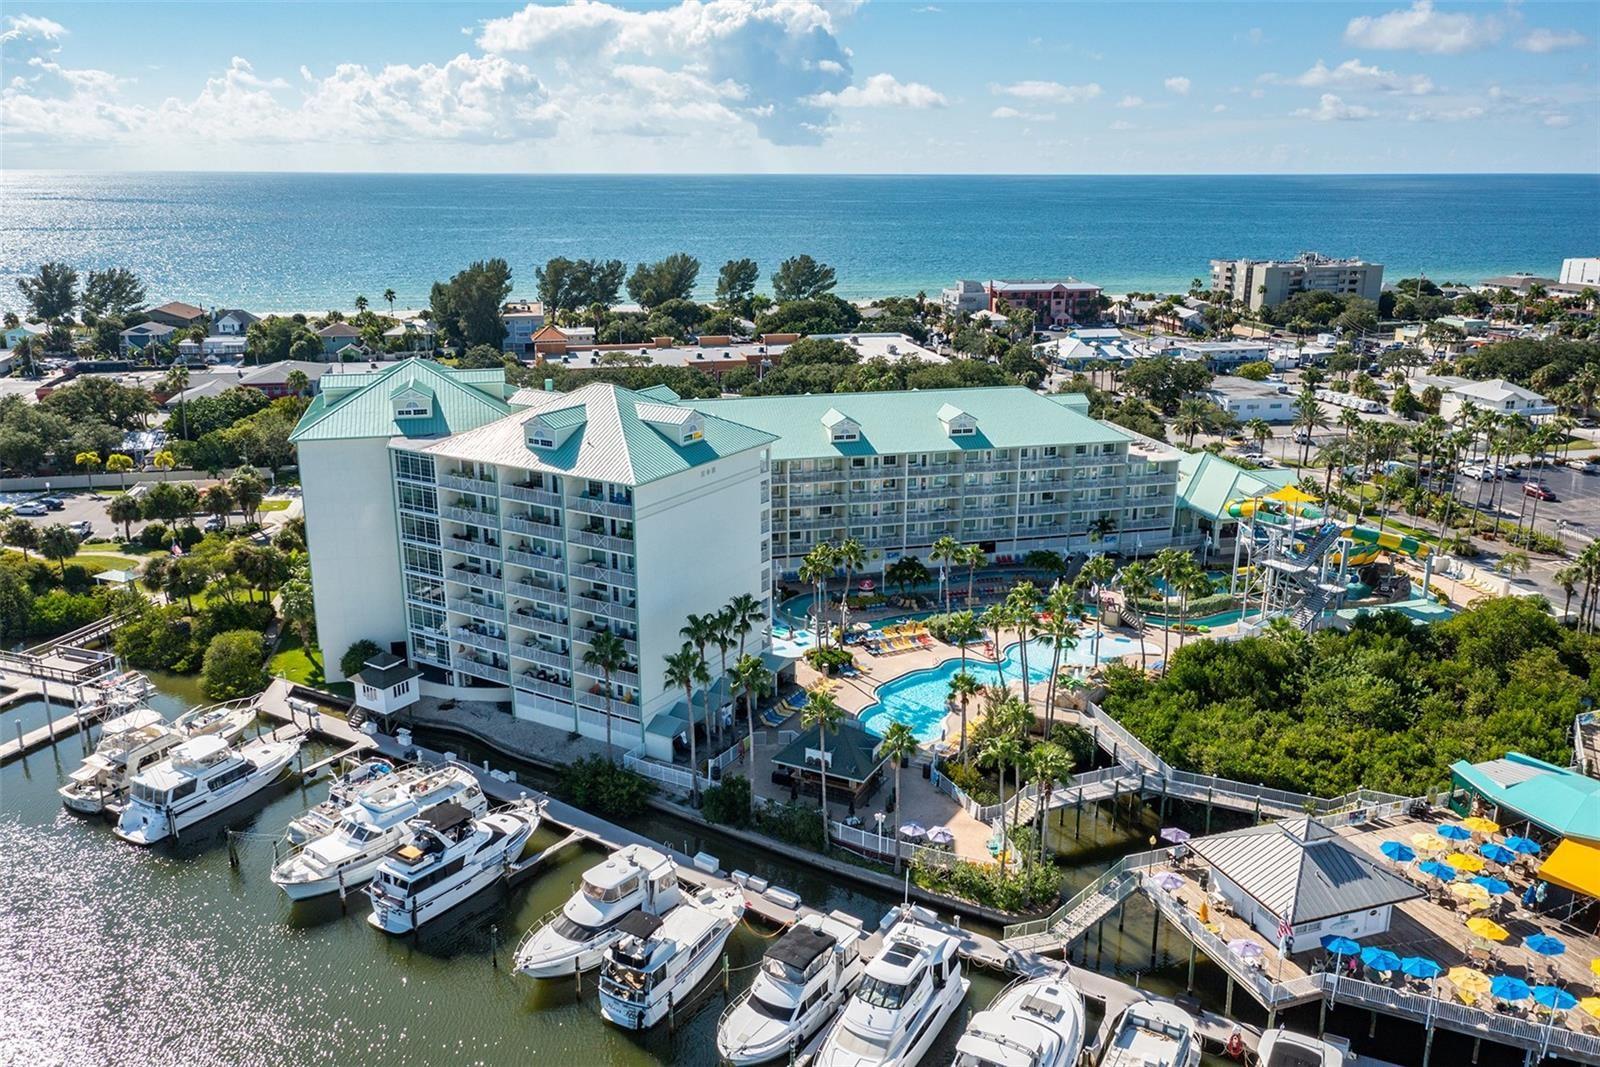 399 2ND STREET #716, Indian Rocks Beach, FL 33785 - #: U8137986